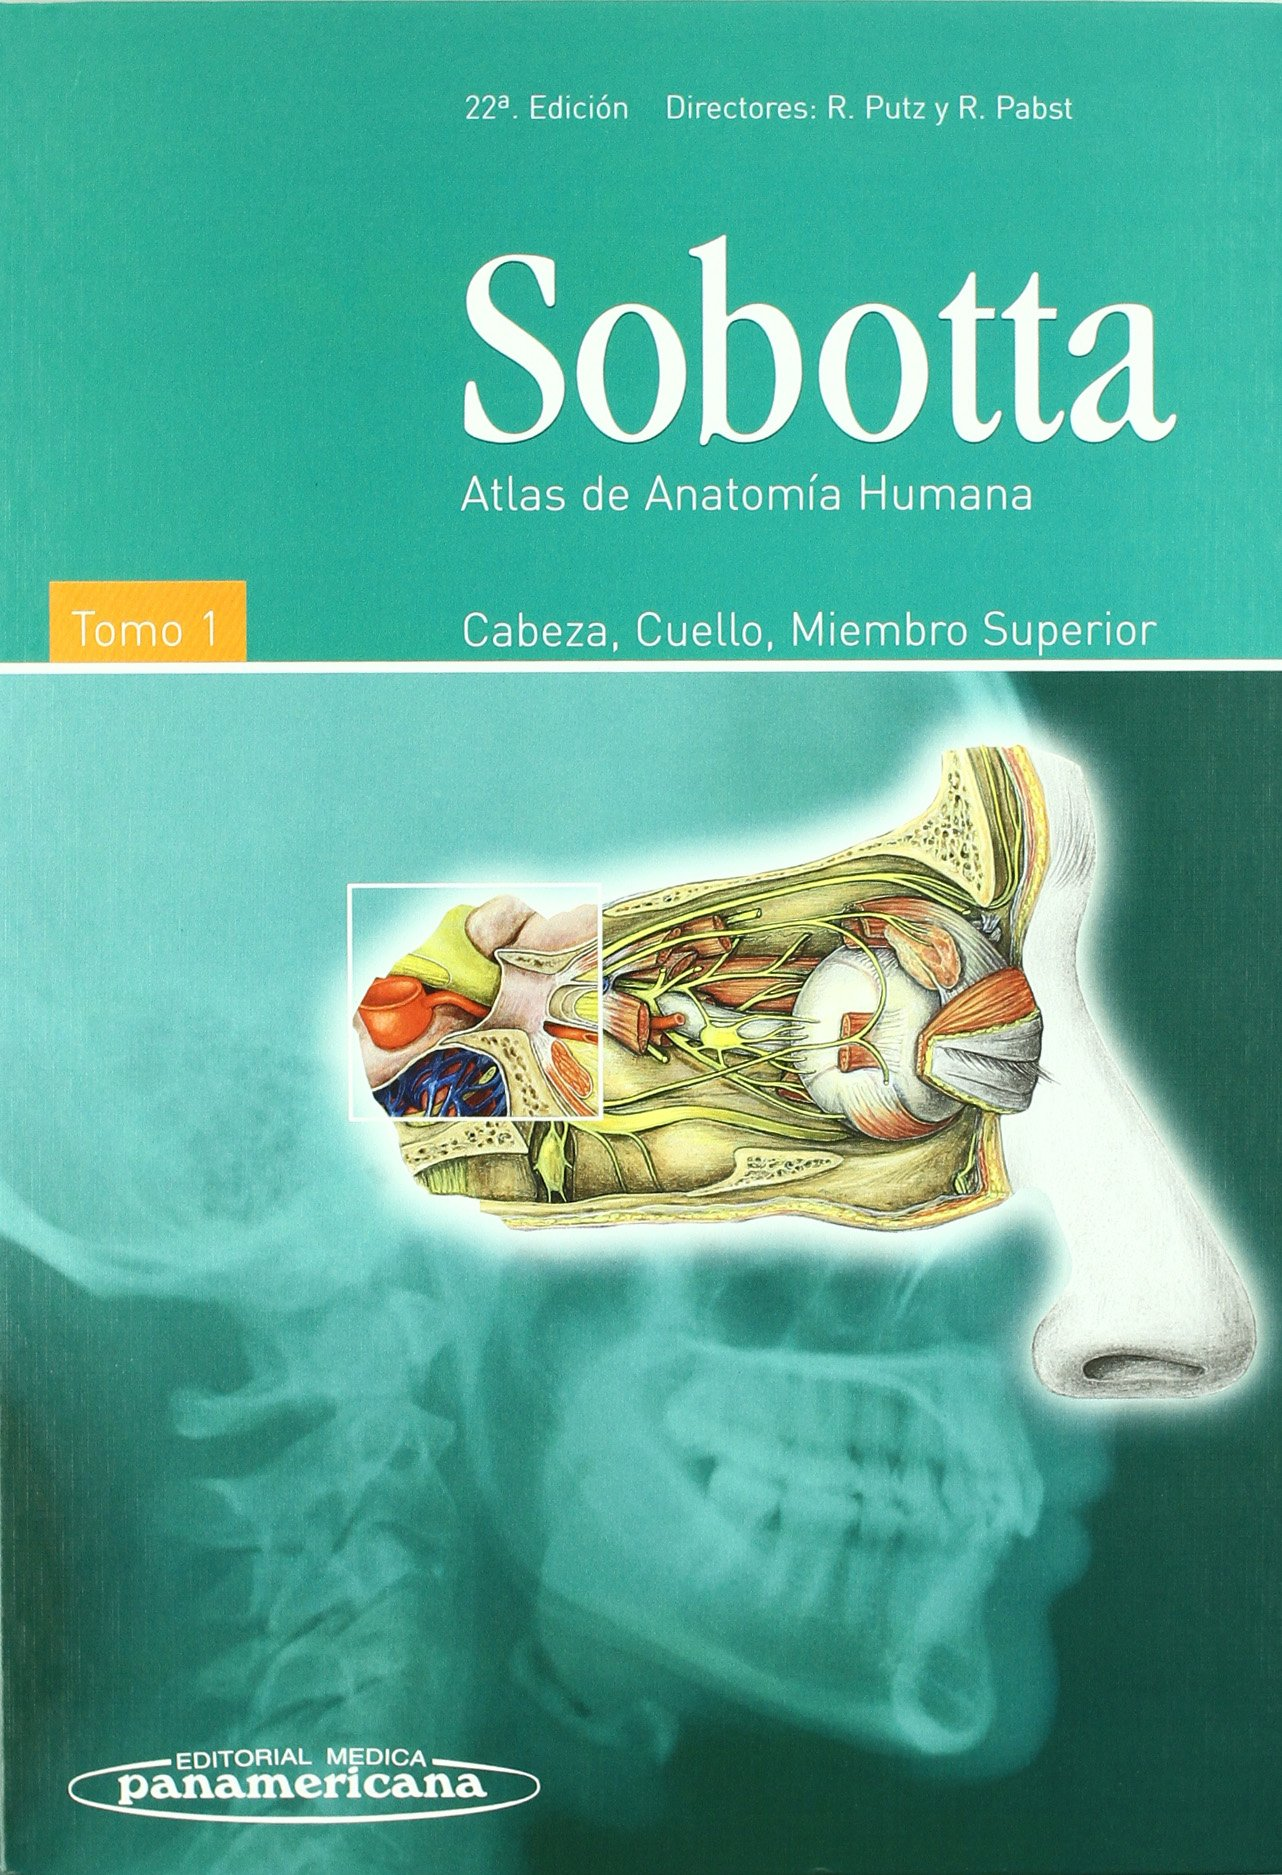 atlas de anatomia humana sobotta gratis